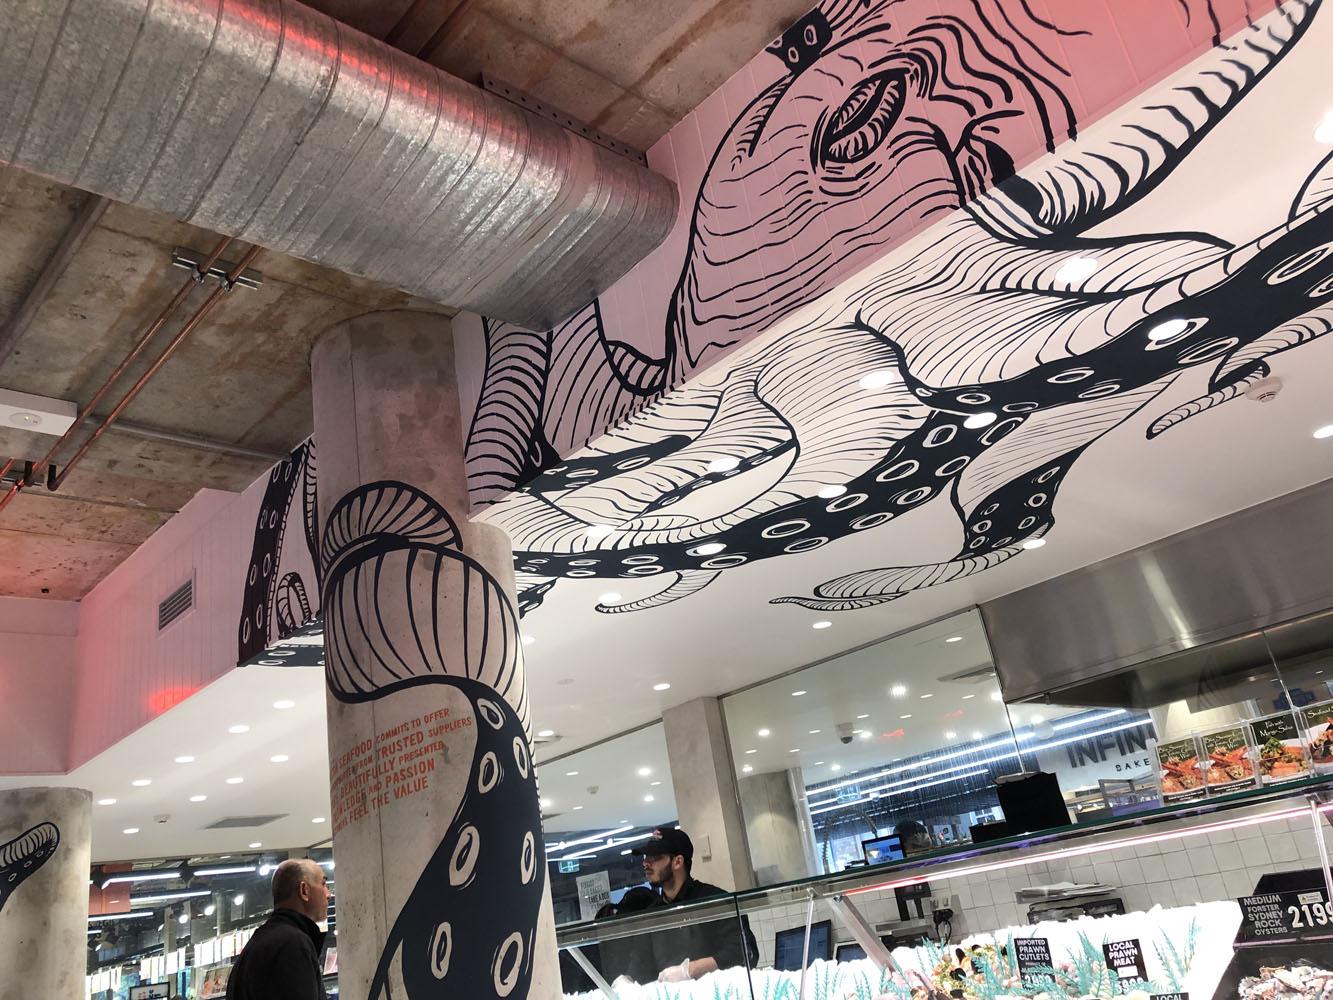 the-art-of-wall-sydney-fresh-seafood-harris-farm-lindfield-octopus-mural-5